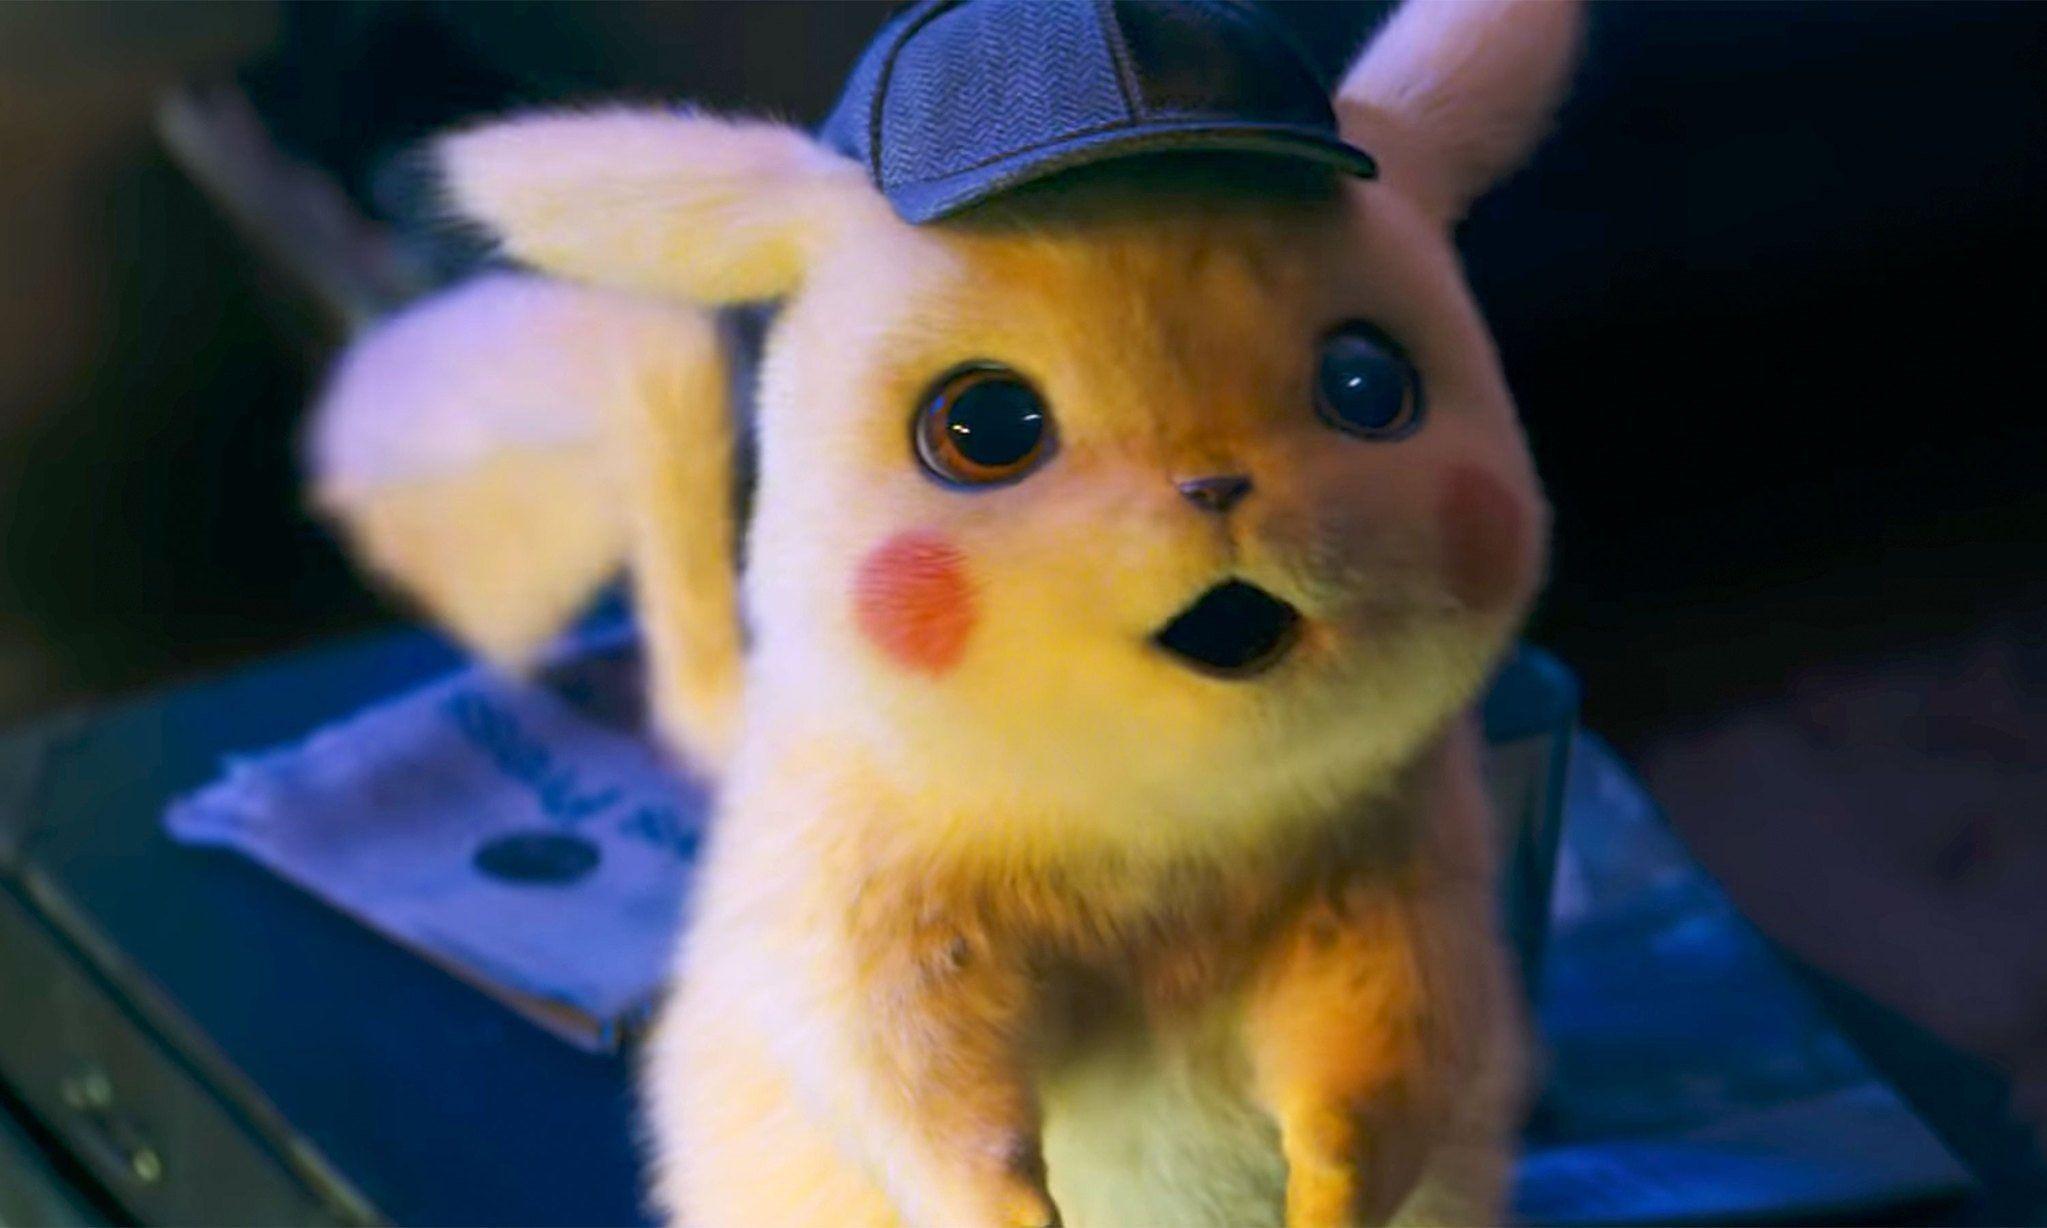 Detective Pikachu filmini izledik